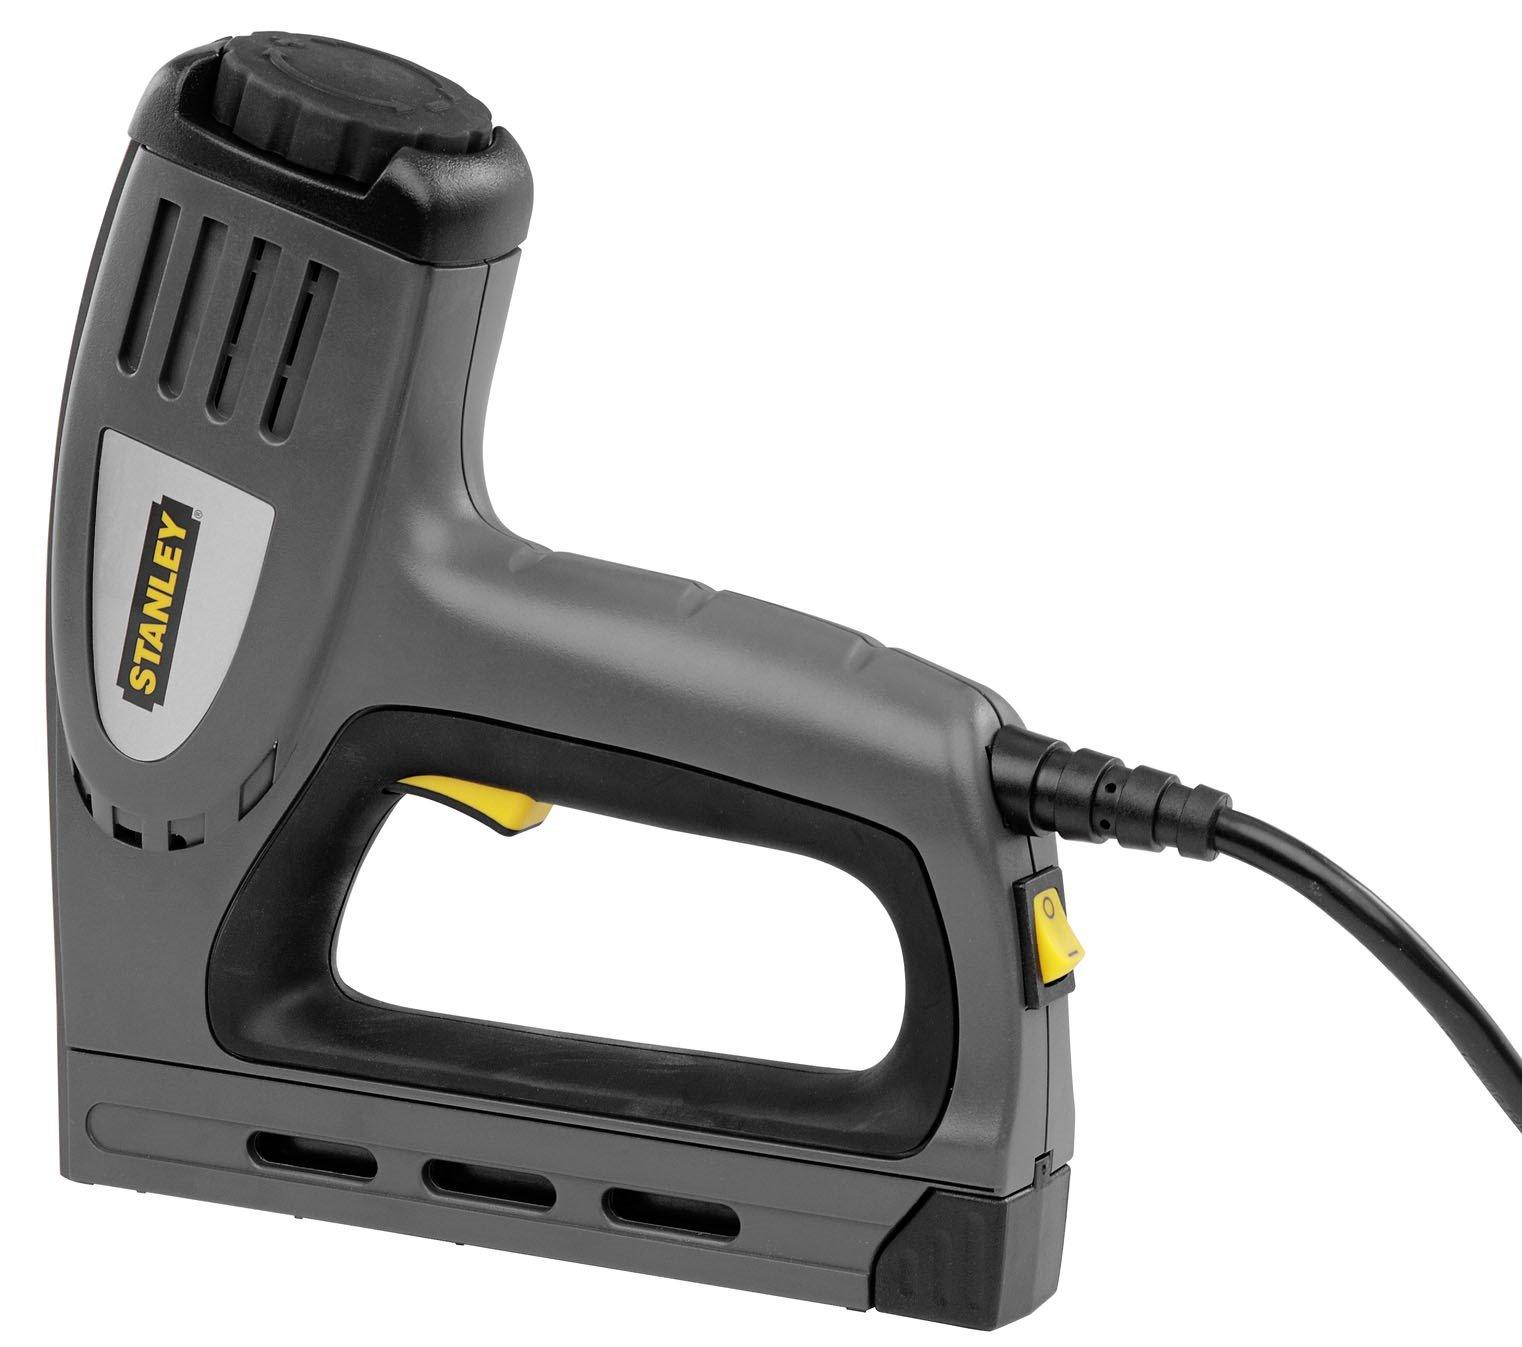 Stanley Hand Tools TRE550Z Electric Staple & Nail Gun